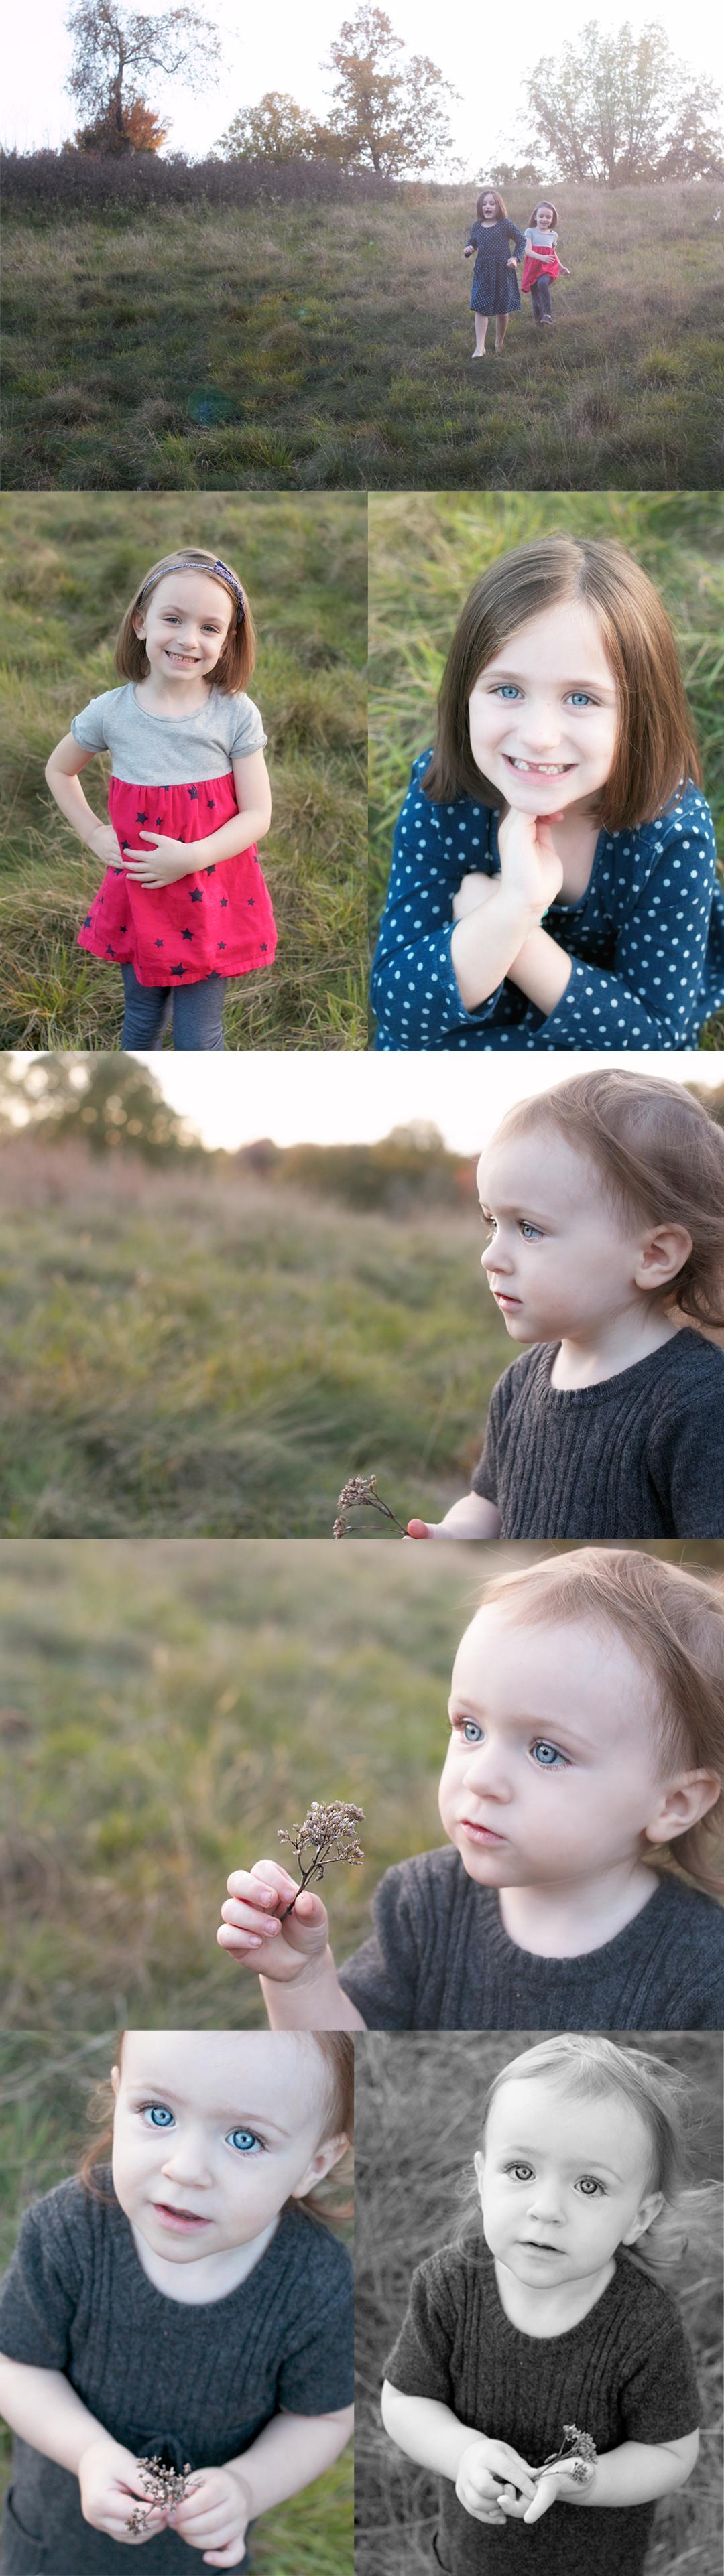 McNelis-fall-family-photos-3